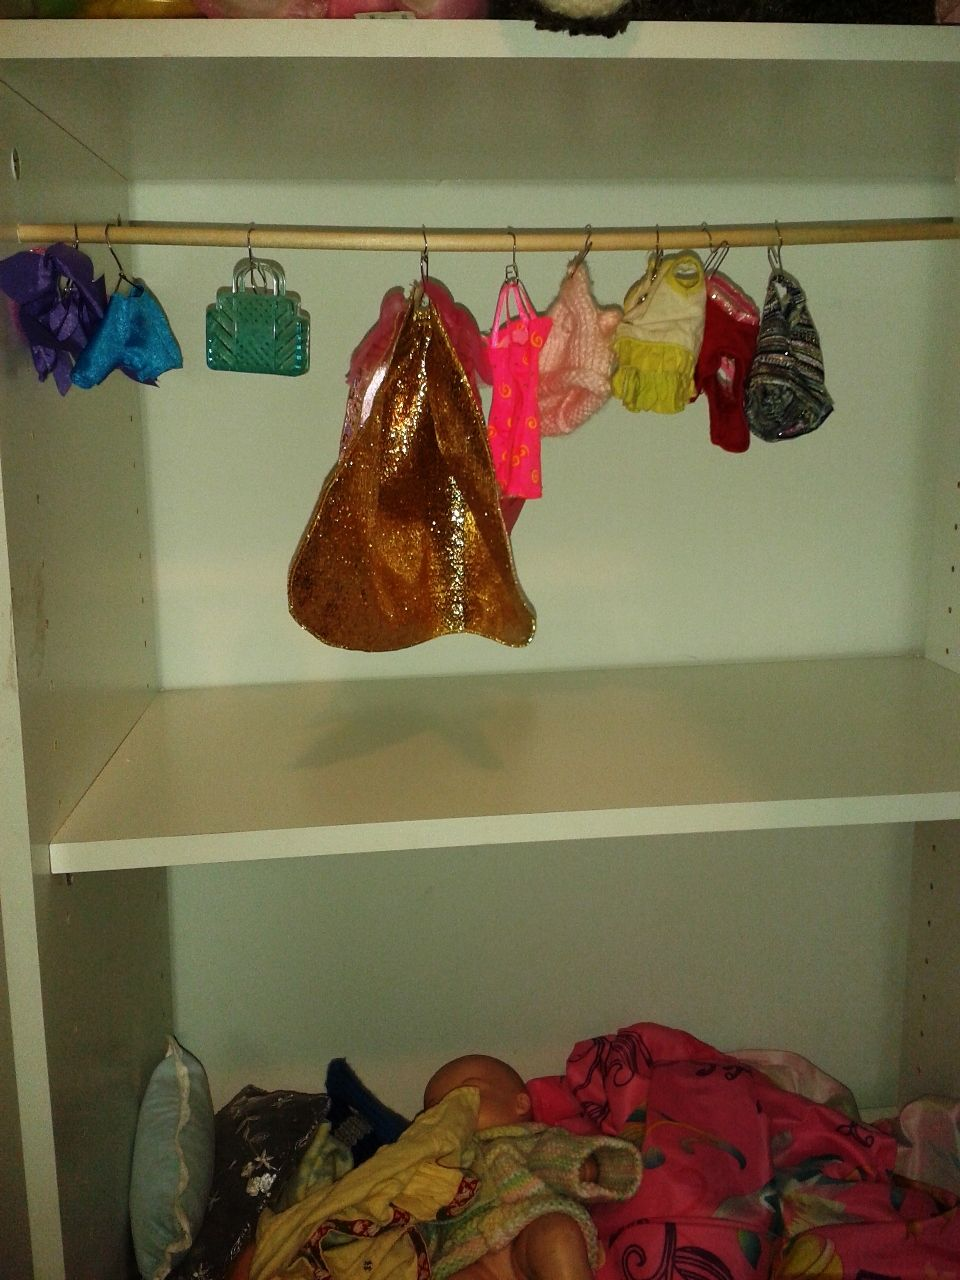 A DIY Barbie closet rod and hangers Diy barbie clothes